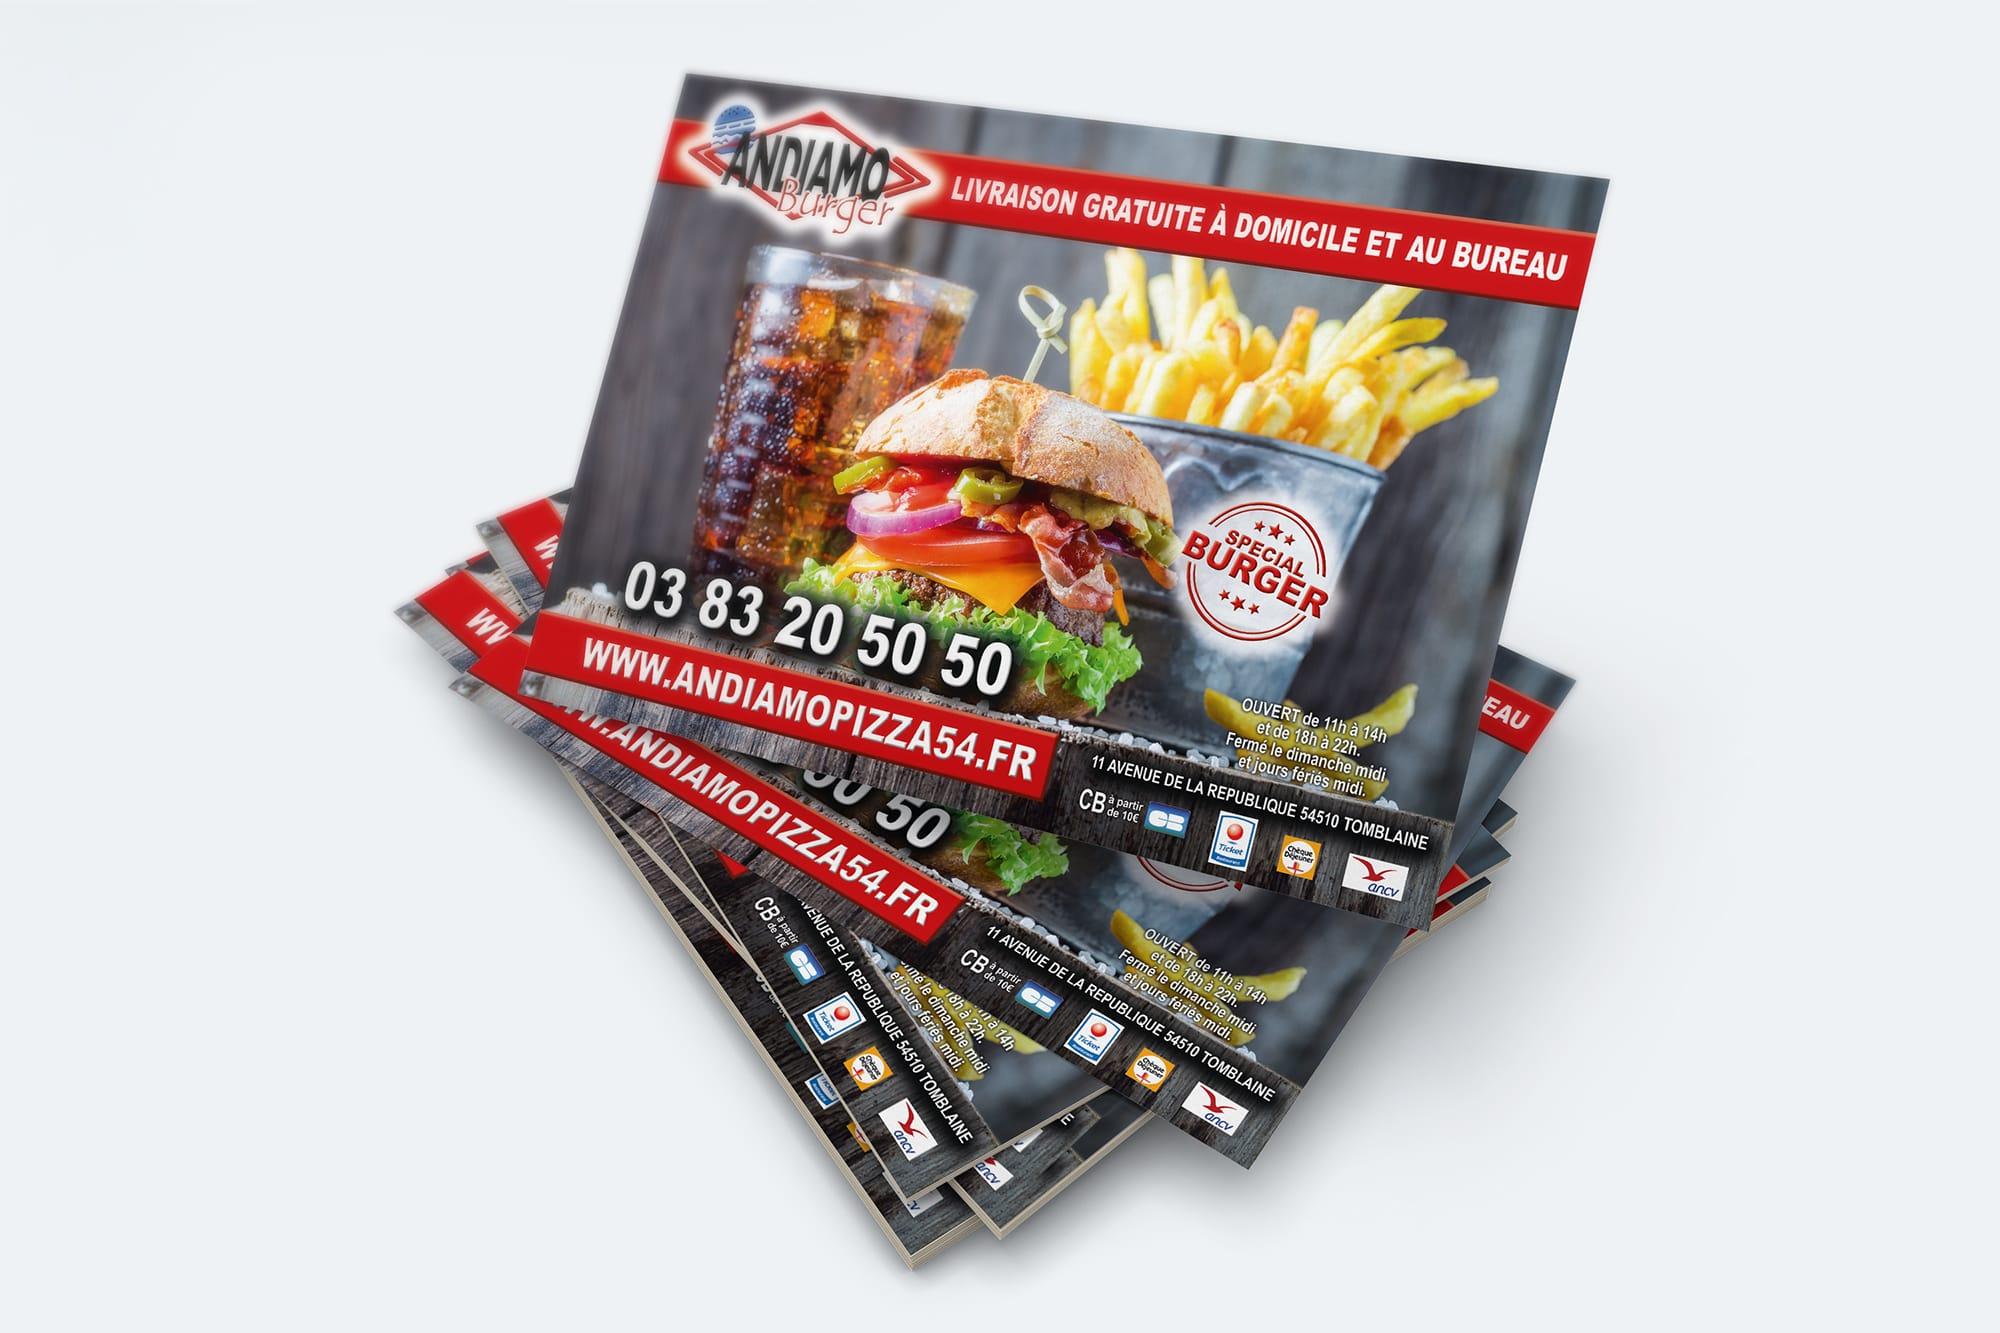 Andiamo burger sbcom steven berg